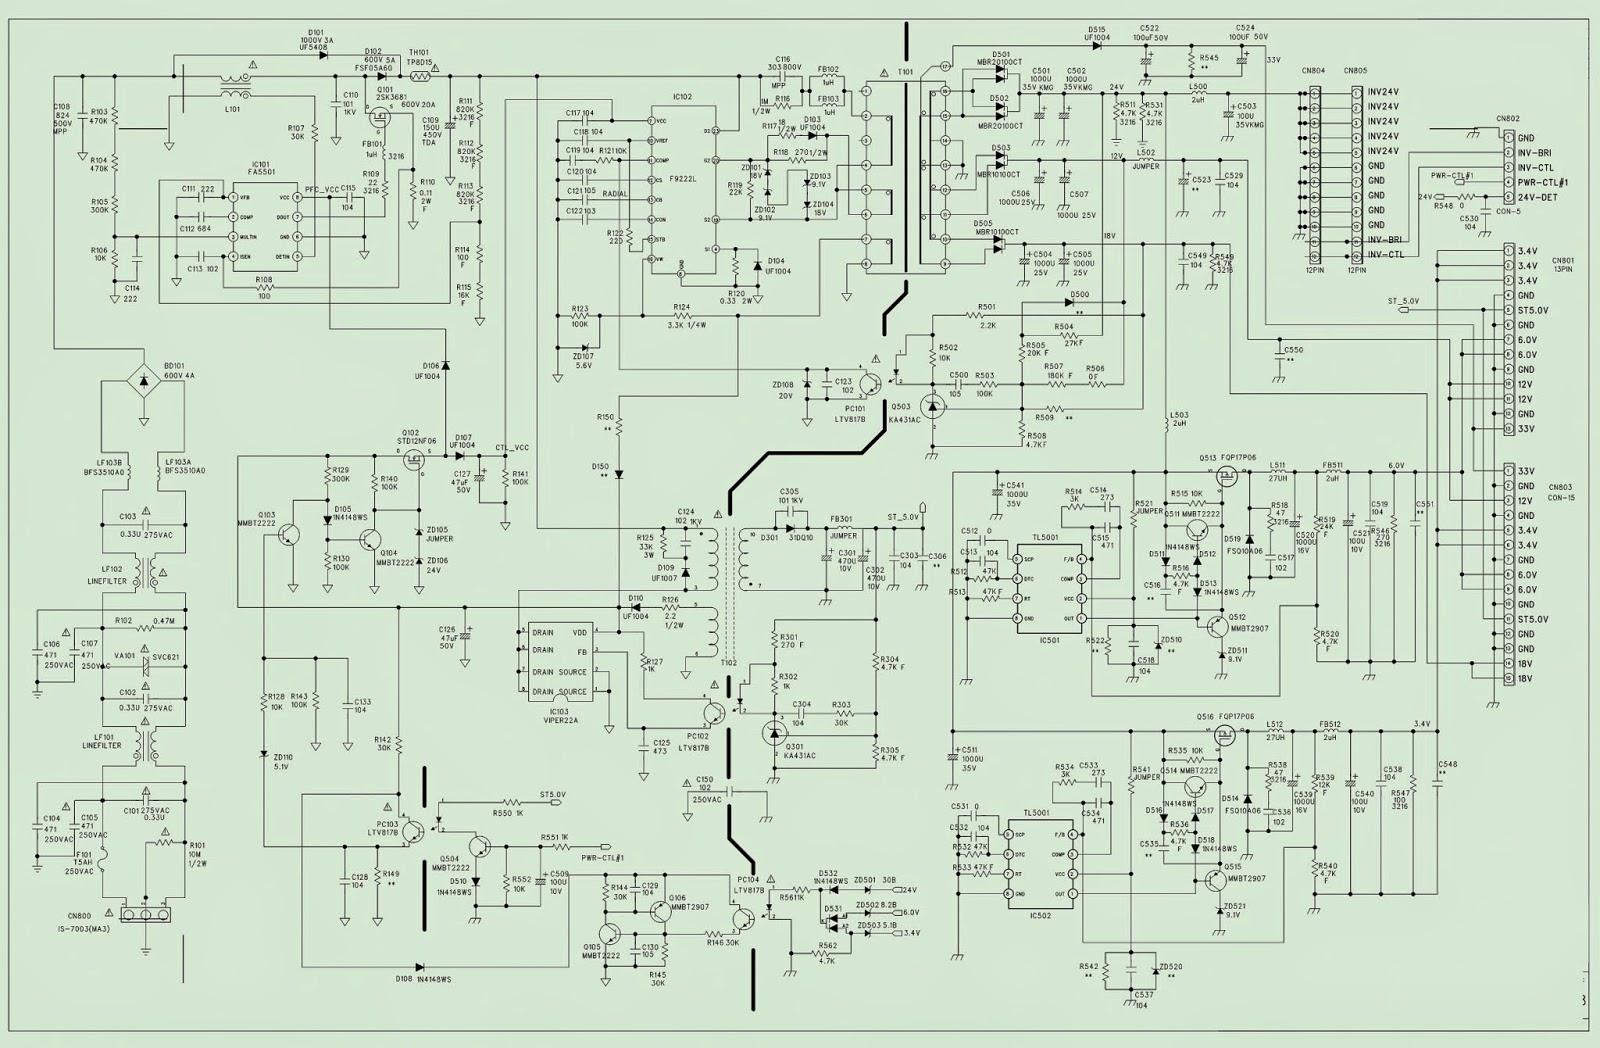 lg microwave oven circuit diagram cub cadet lawn mower parts diagrams wiring tv 11 19 stromoeko de lm6700 schematic rh 69 twizer co dryer